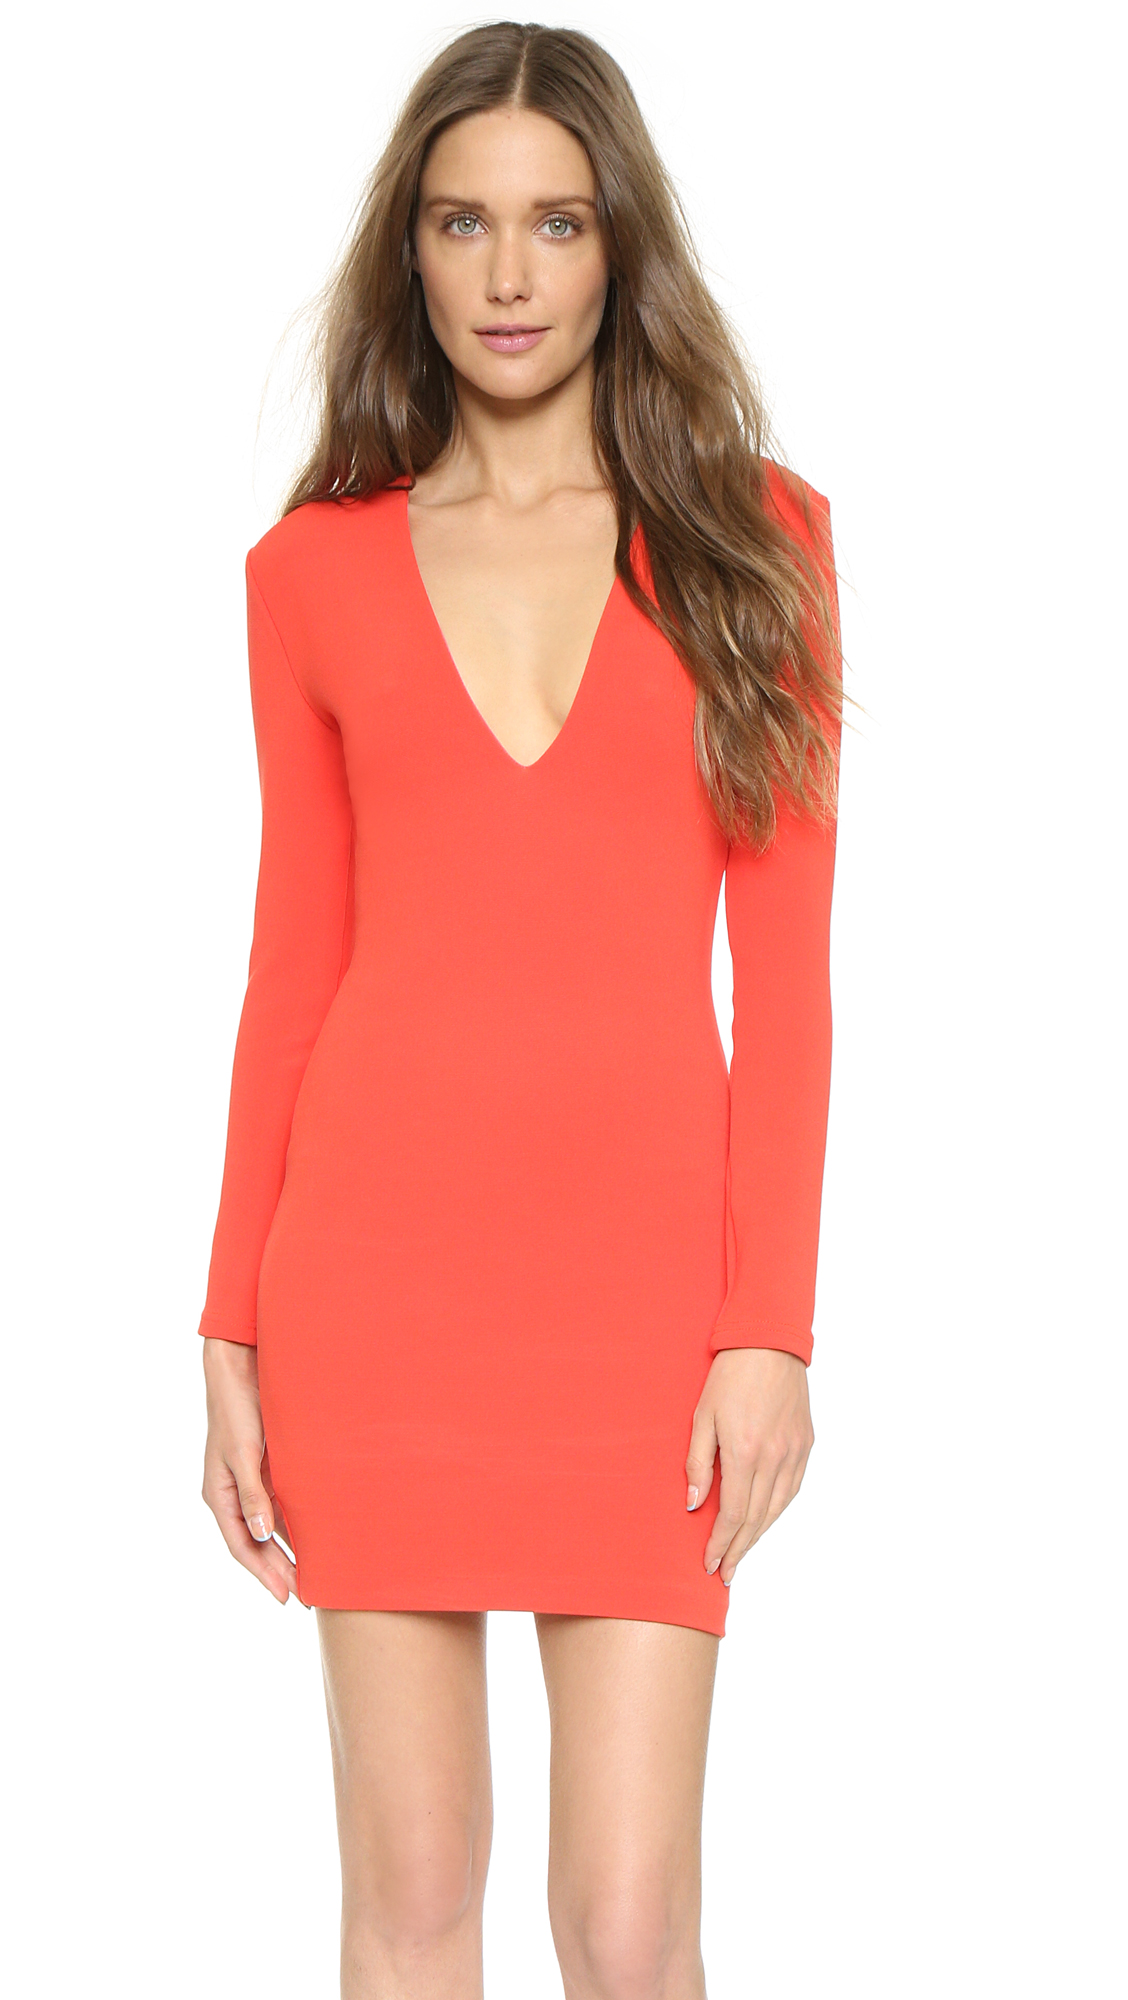 cbabe22bdf32 Bec & Bridge Long Sleeve Reversible Mini Dress | SHOPBOP